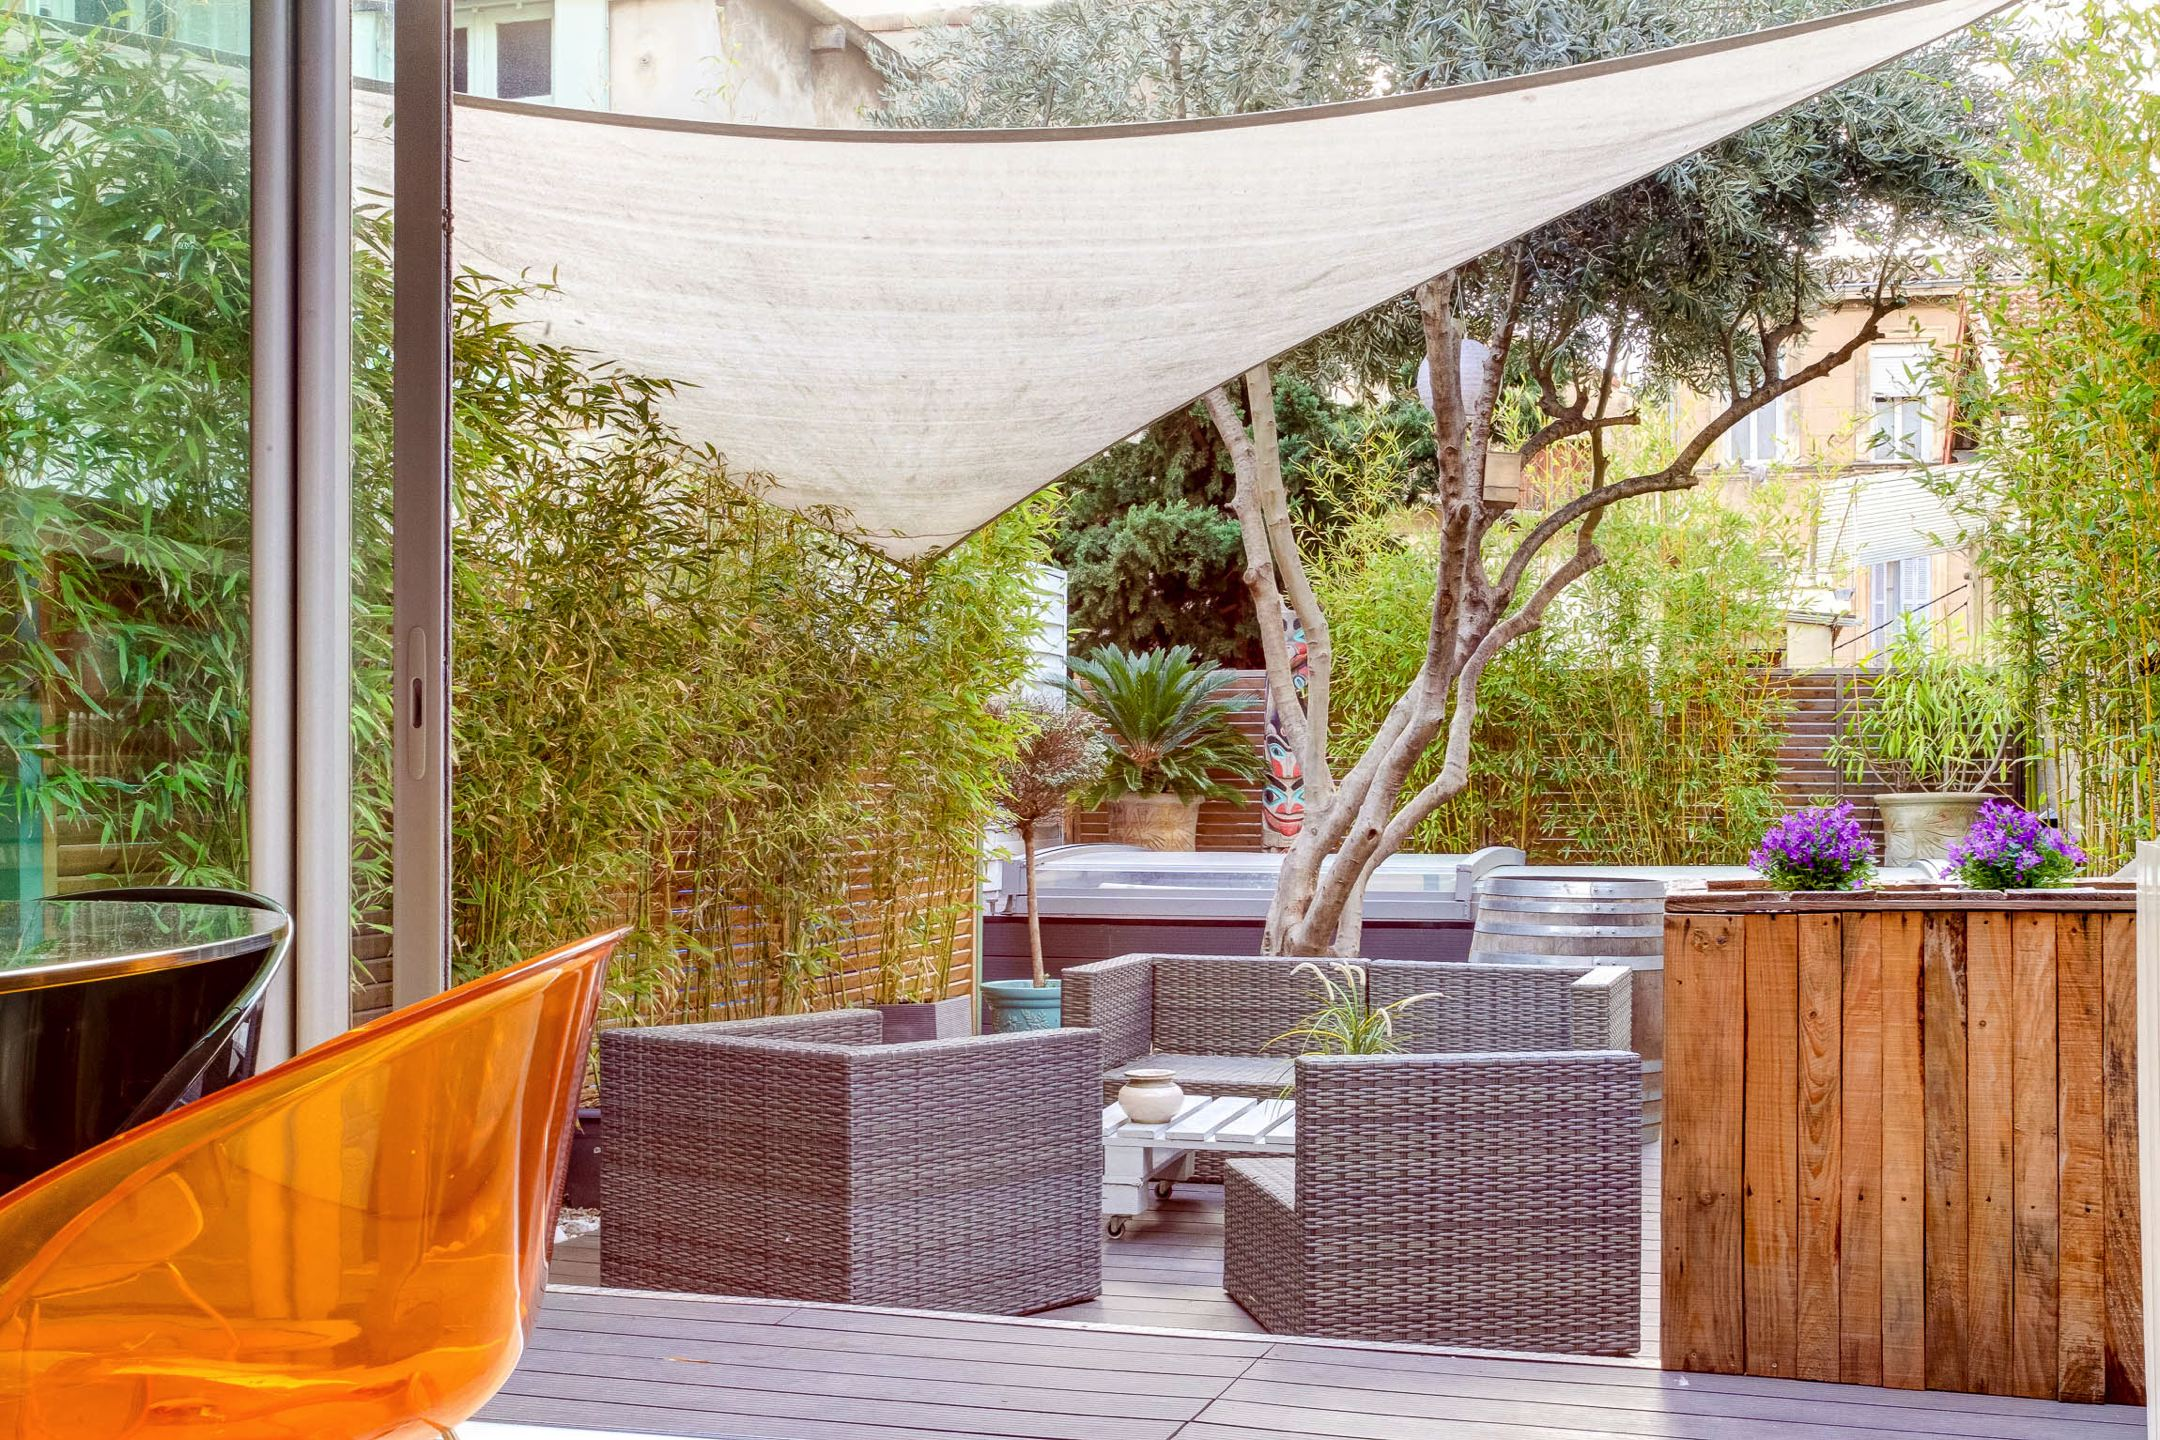 meilleur de jardin en terrasse sabakunohana. Black Bedroom Furniture Sets. Home Design Ideas